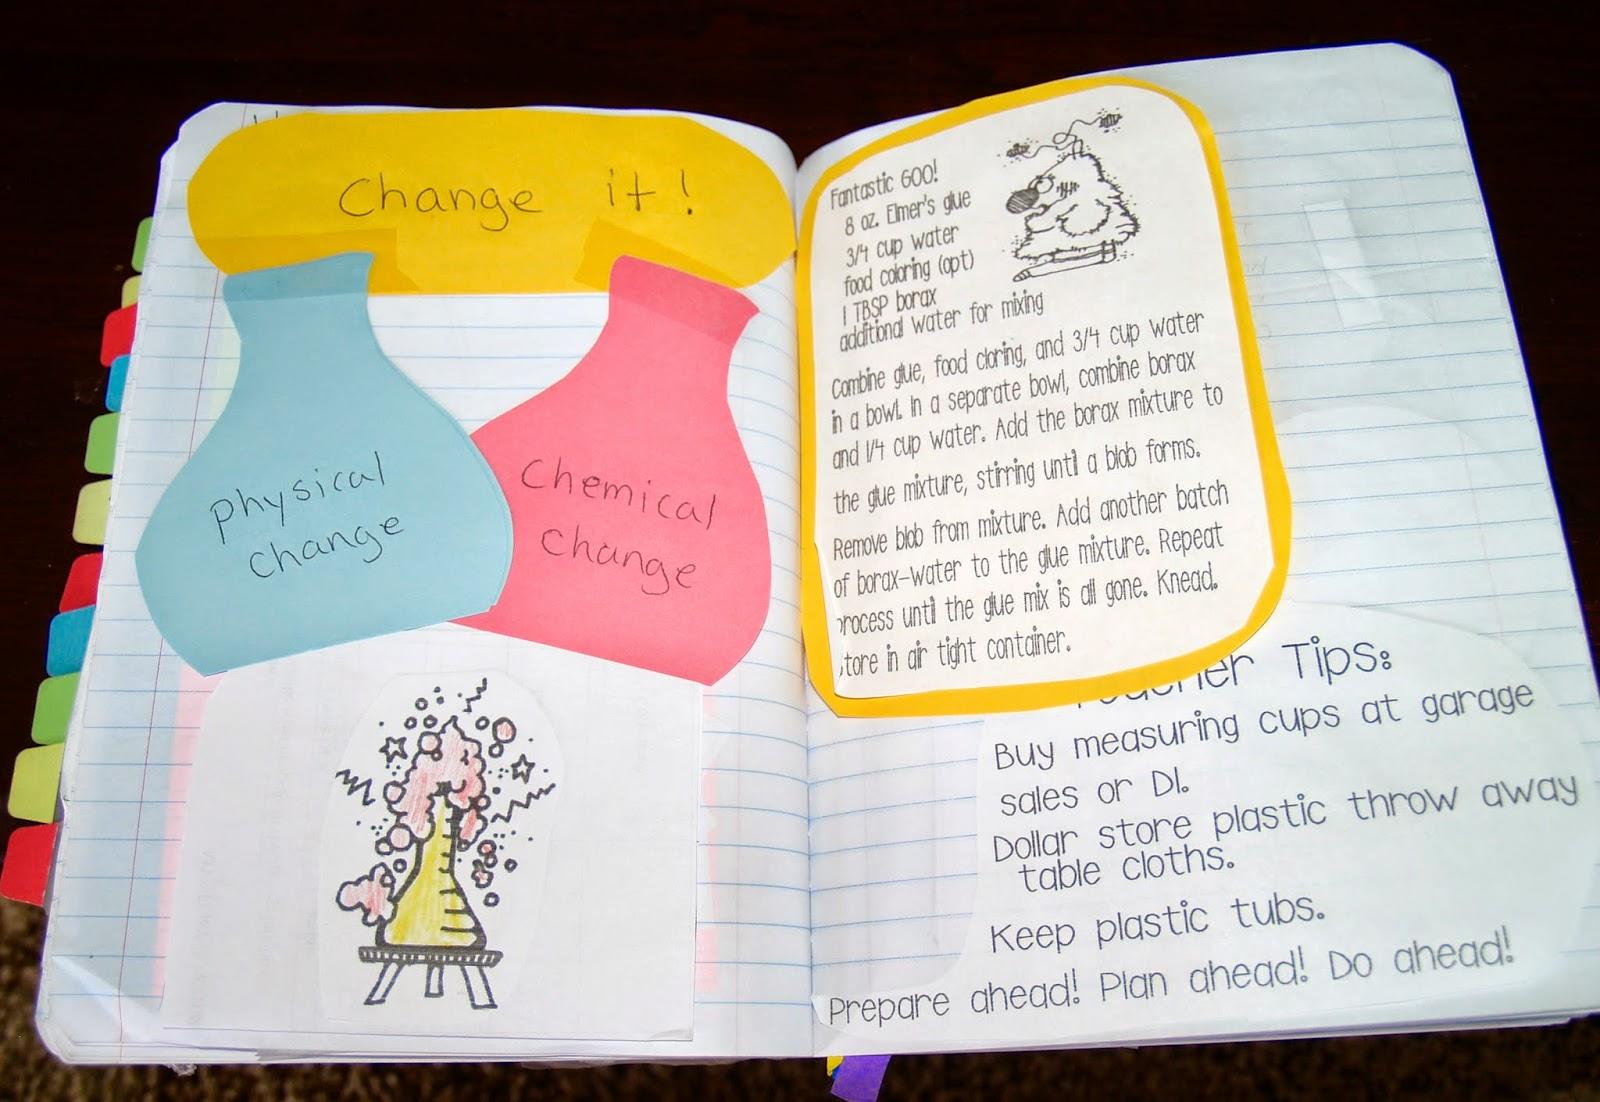 Teaching Science With Lynda Styrofoam Peanuts And Acetone